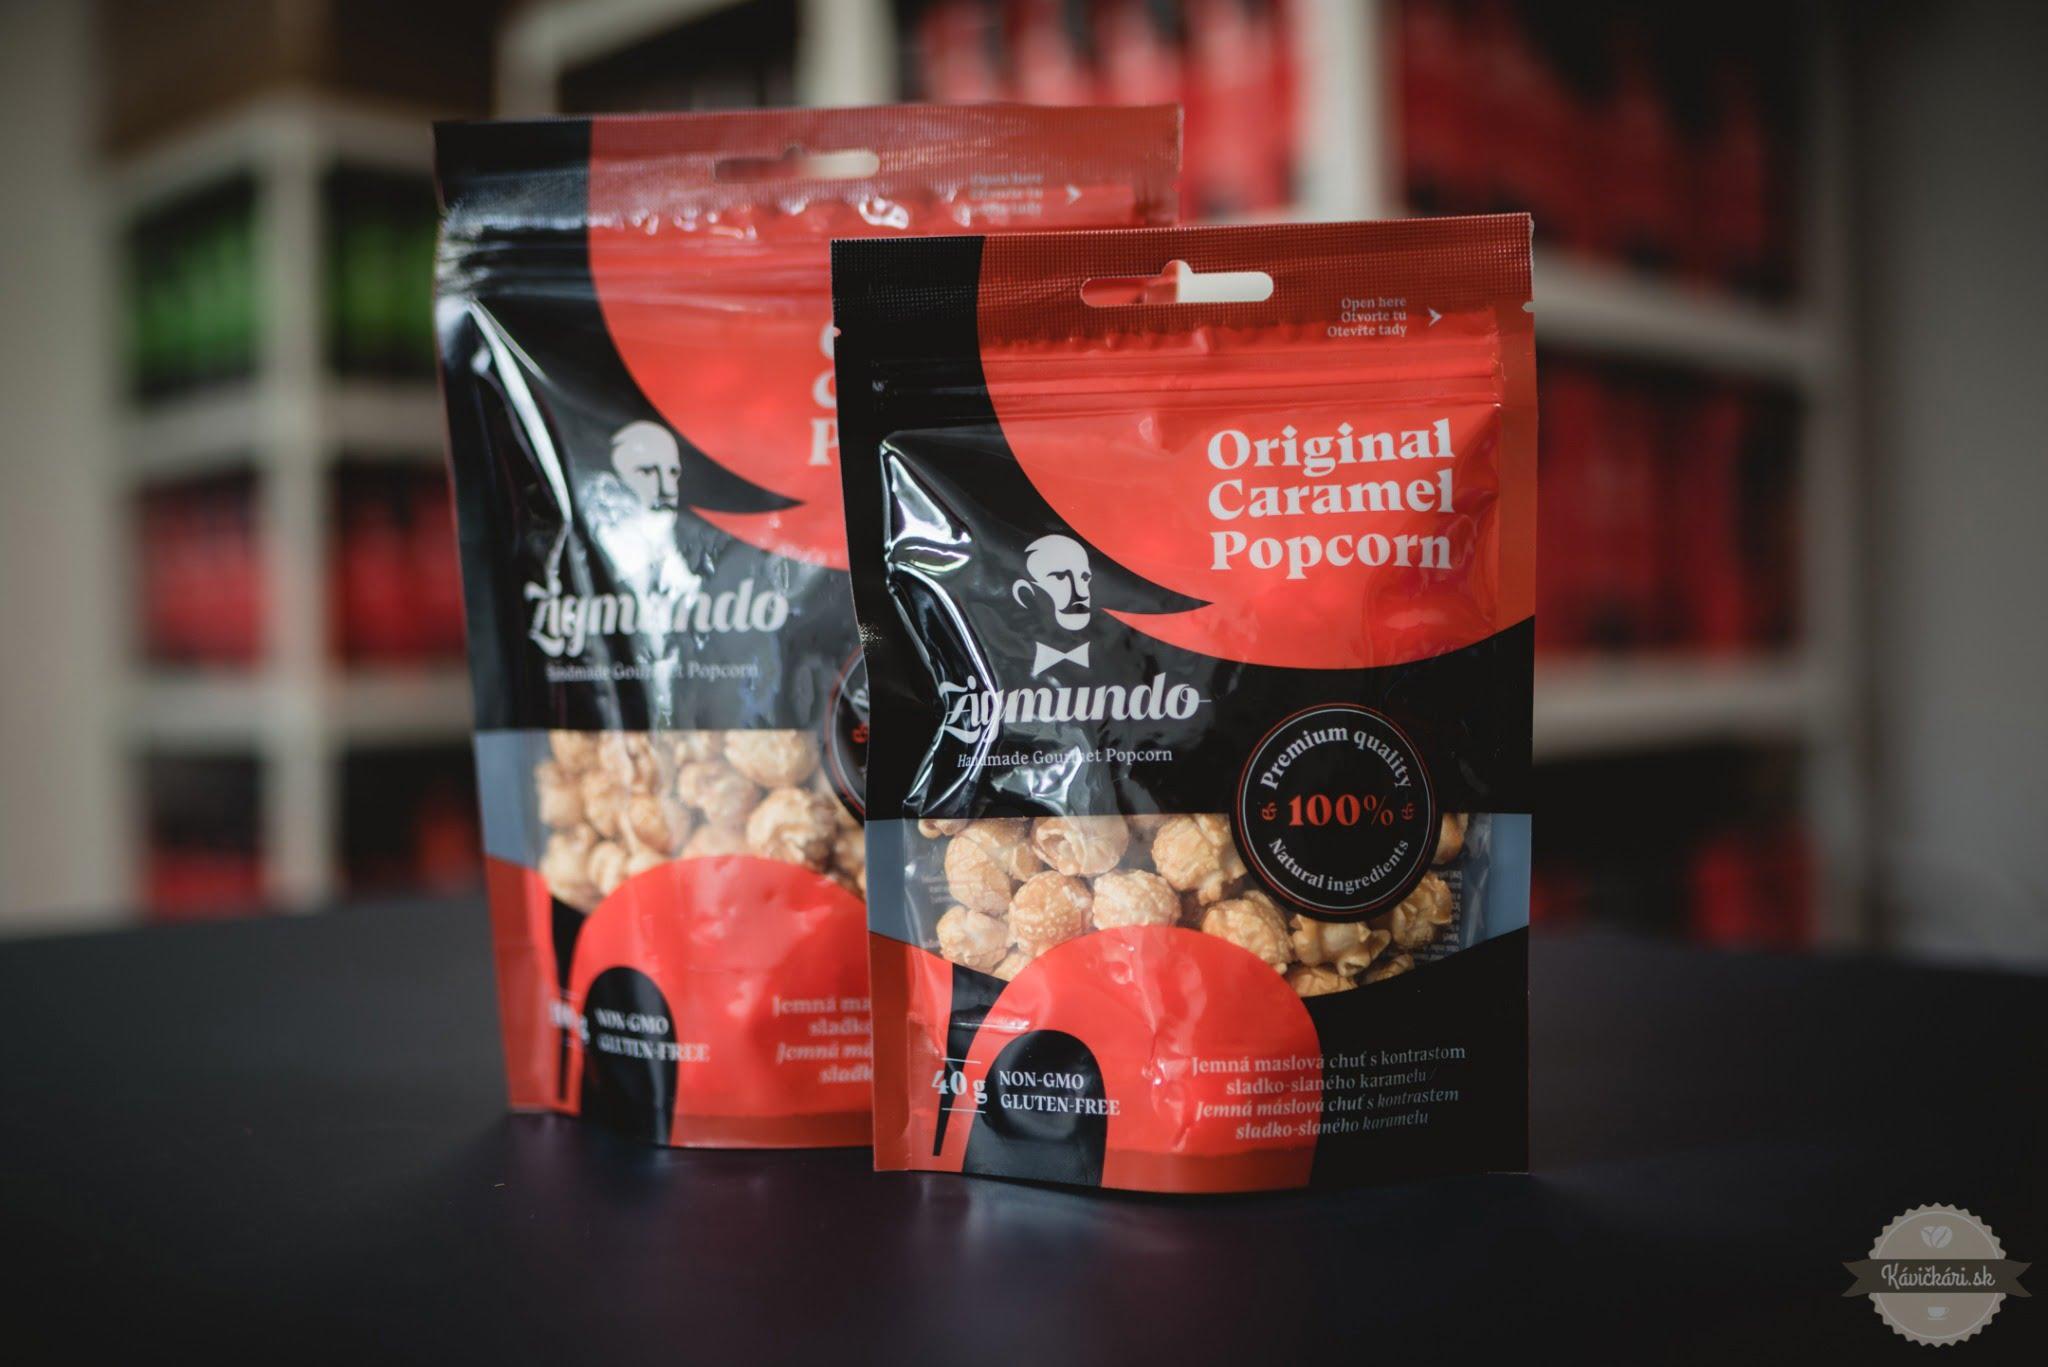 Zigmundo handmade gourmet popcorn